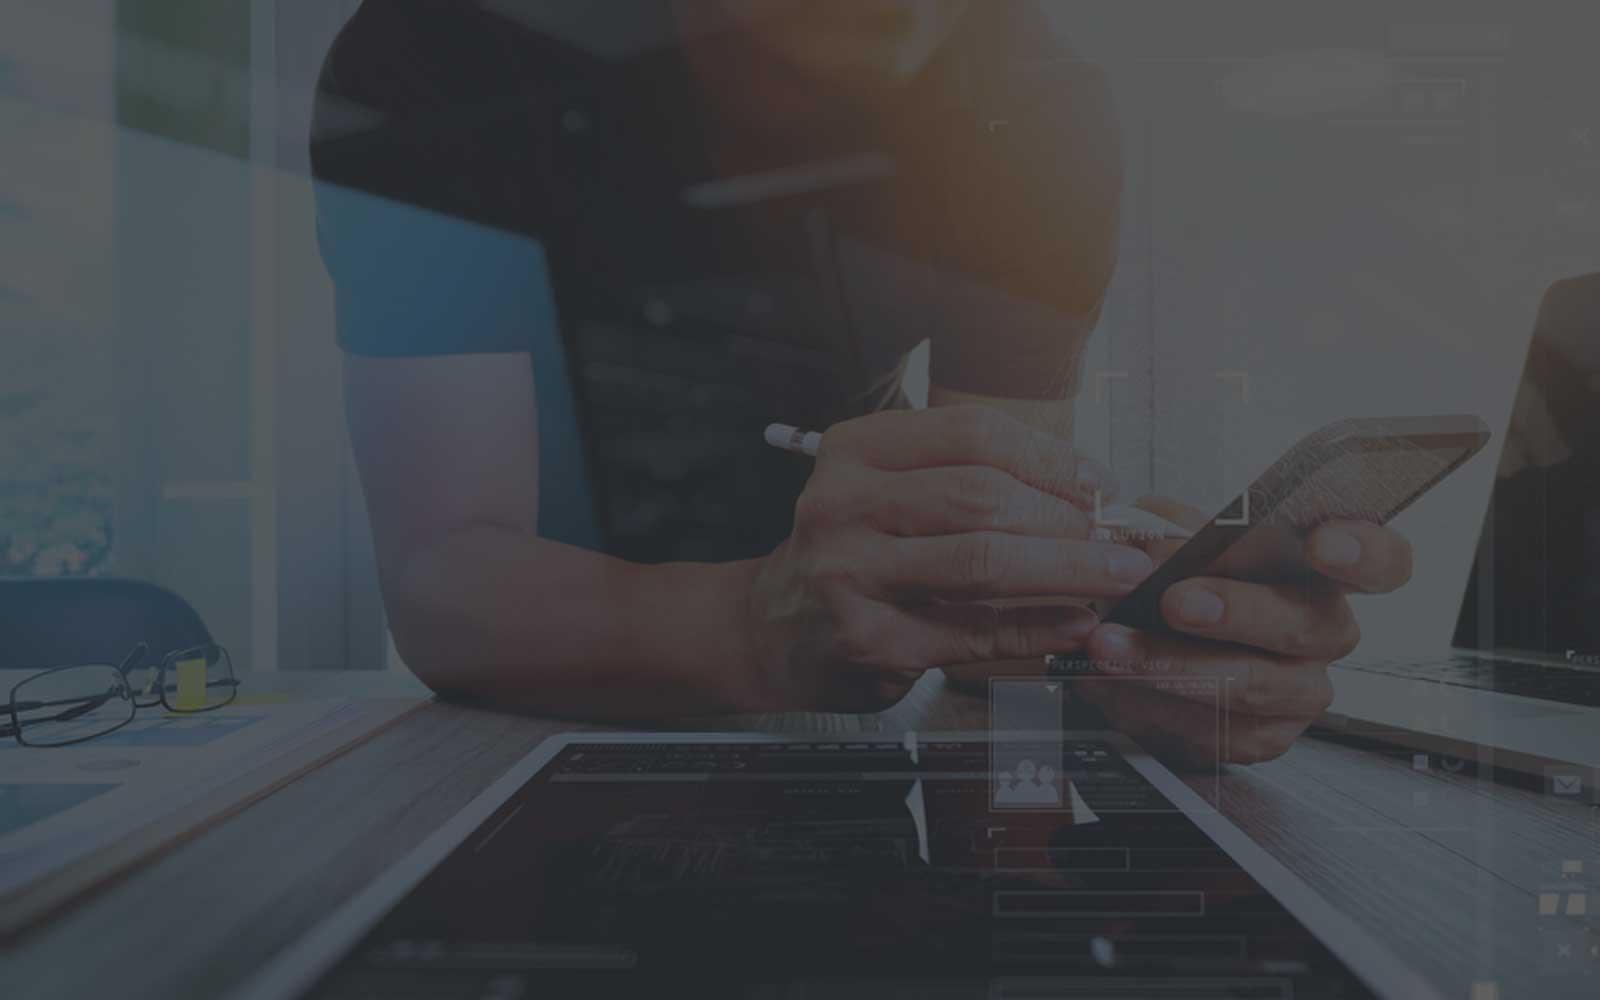 website designer working on responsive design for tablet, laptop, and phone